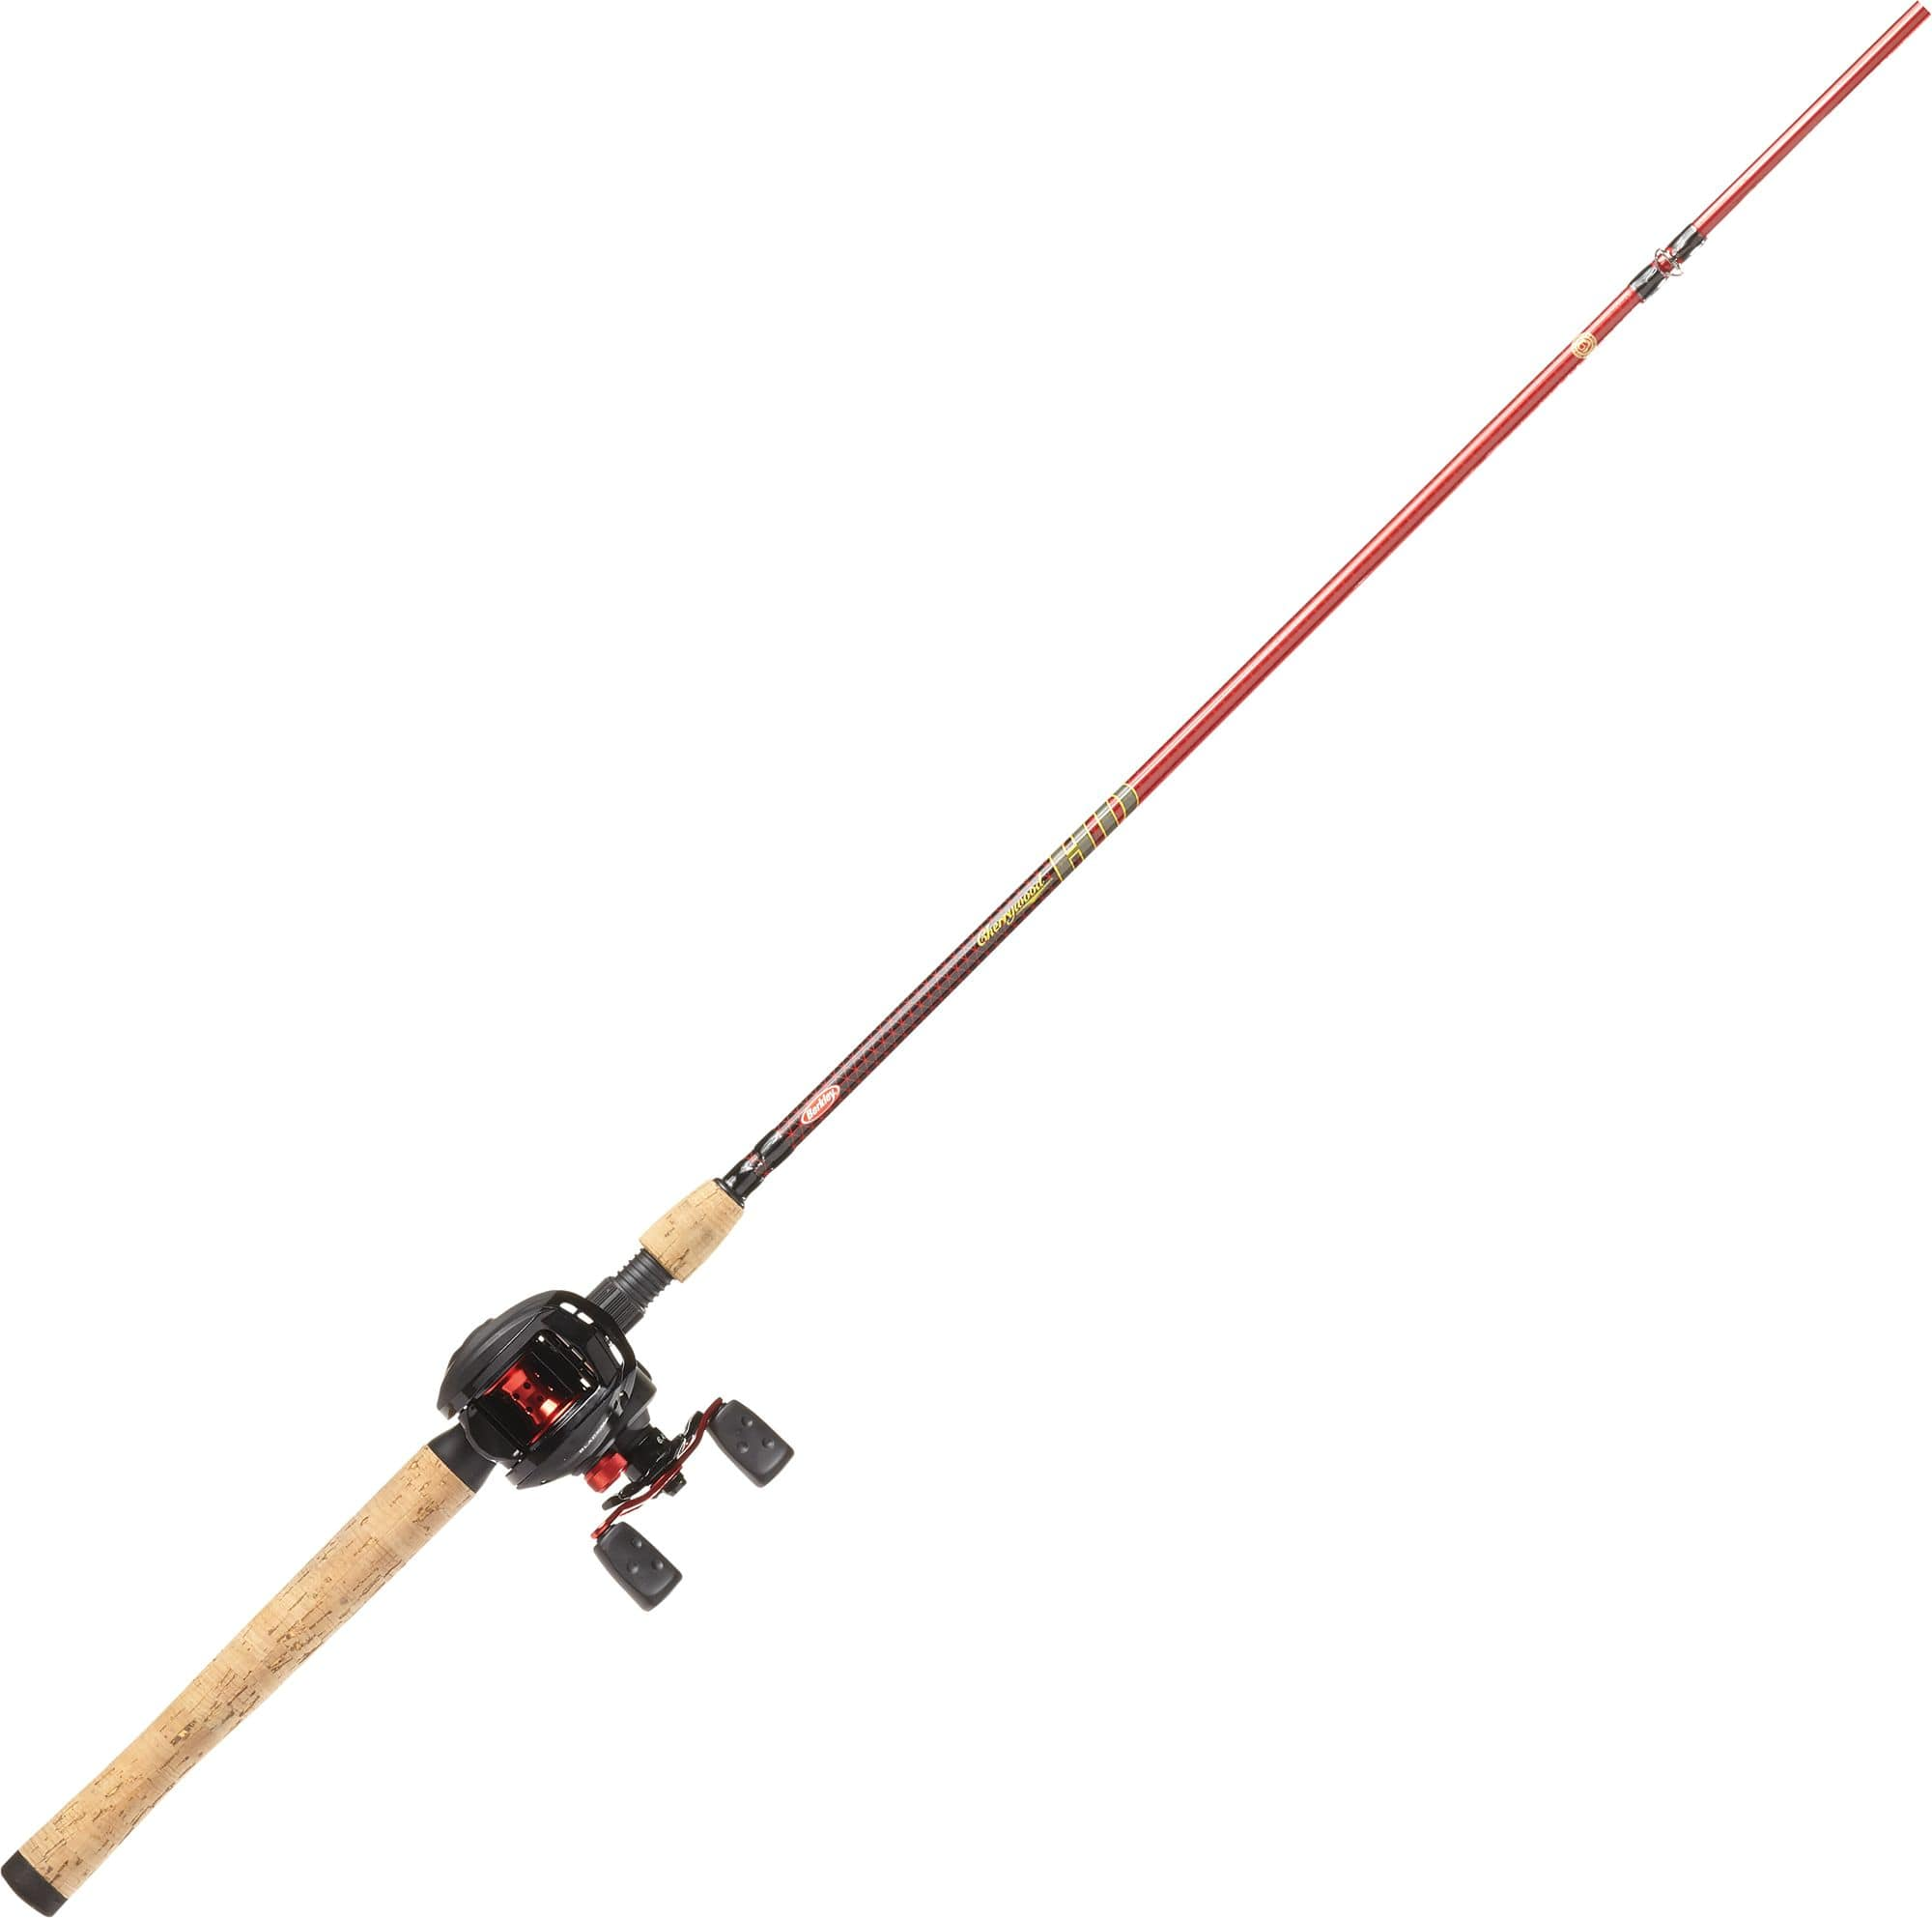 Berkley Cherrywood HD Black Max Baitcasting Combo, 1-piece, 7-ft, $30.00 AR @Dicks Sporting Goods